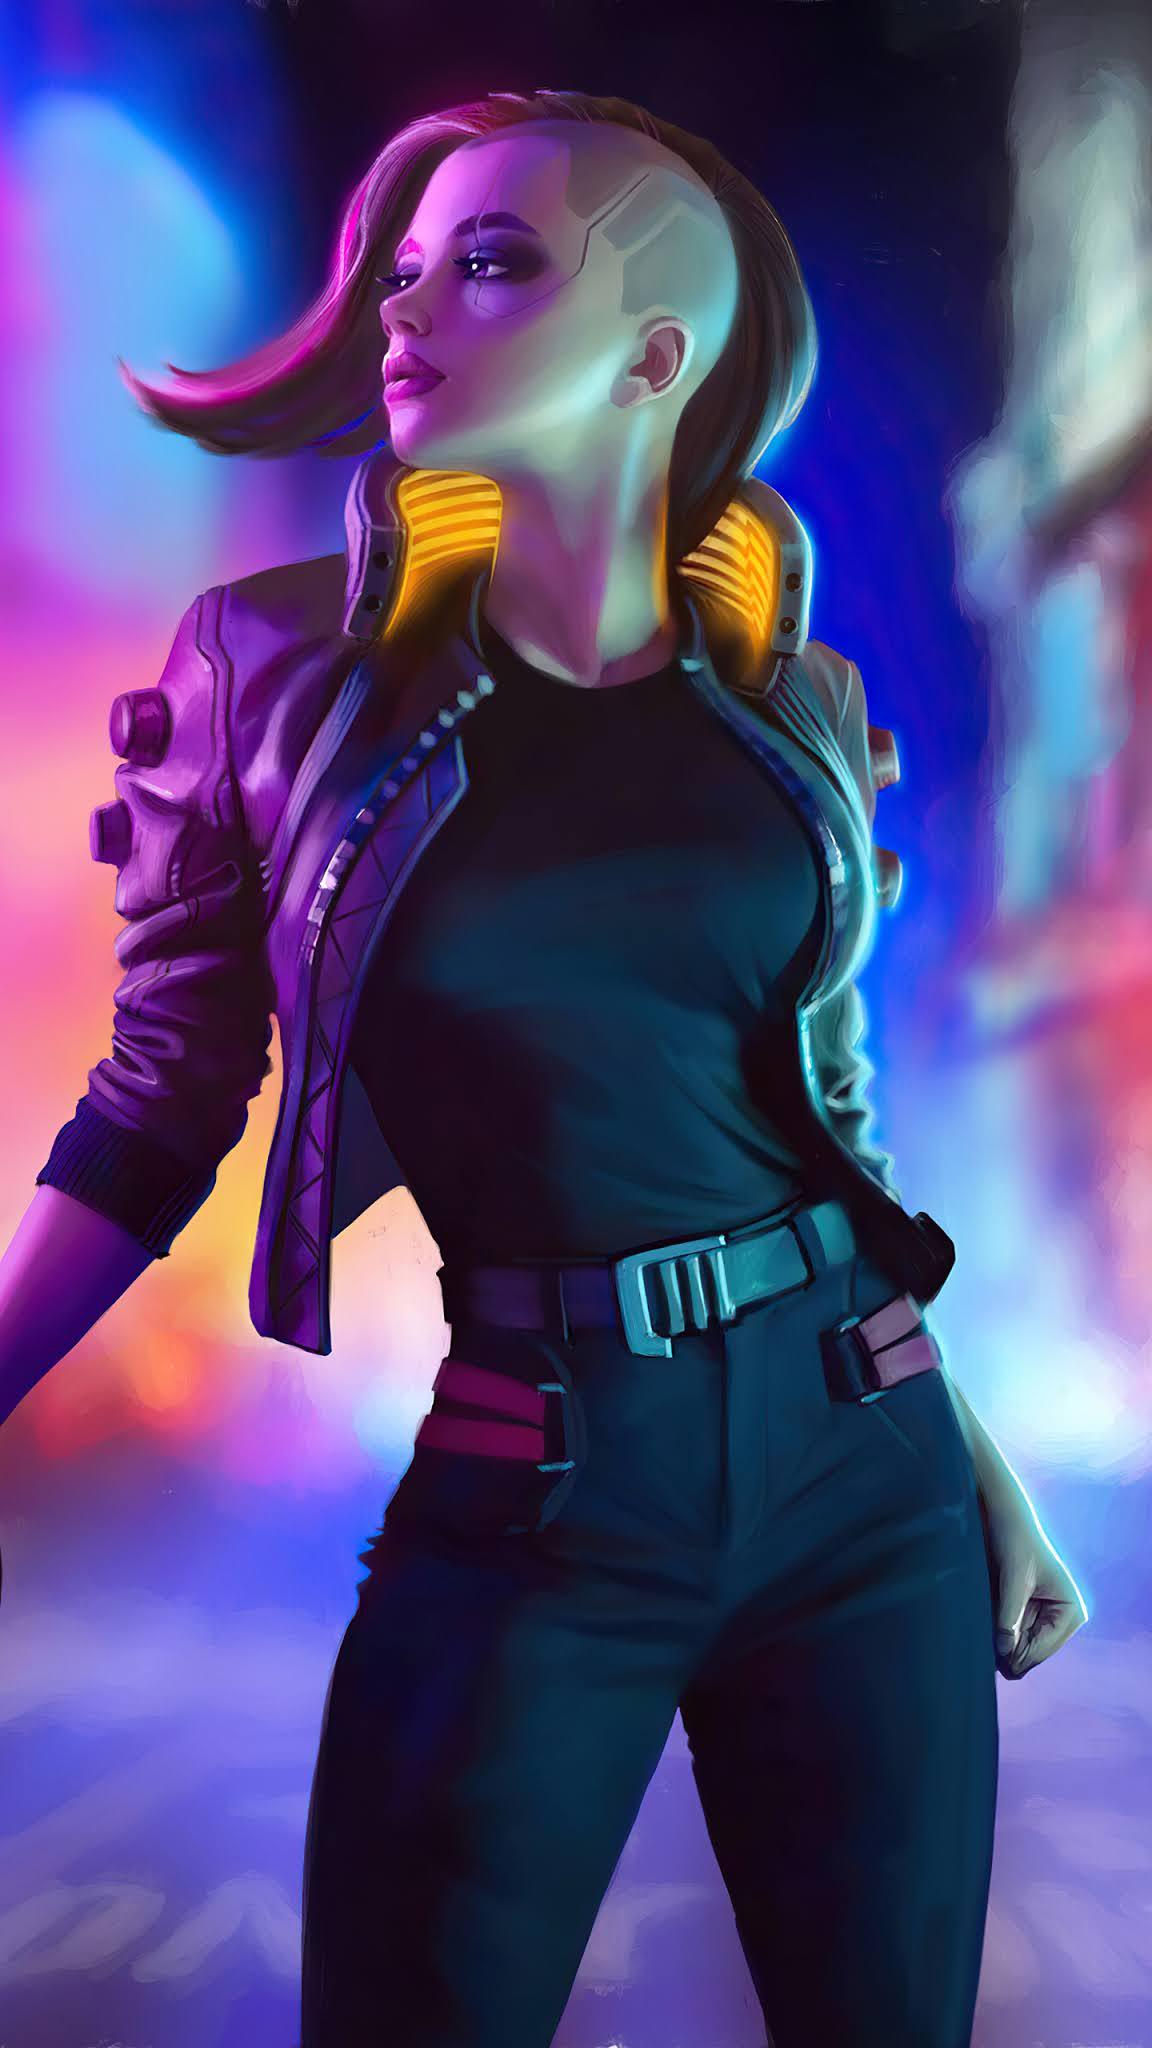 Cyberpunk 2077 Girl mobile wallpaper